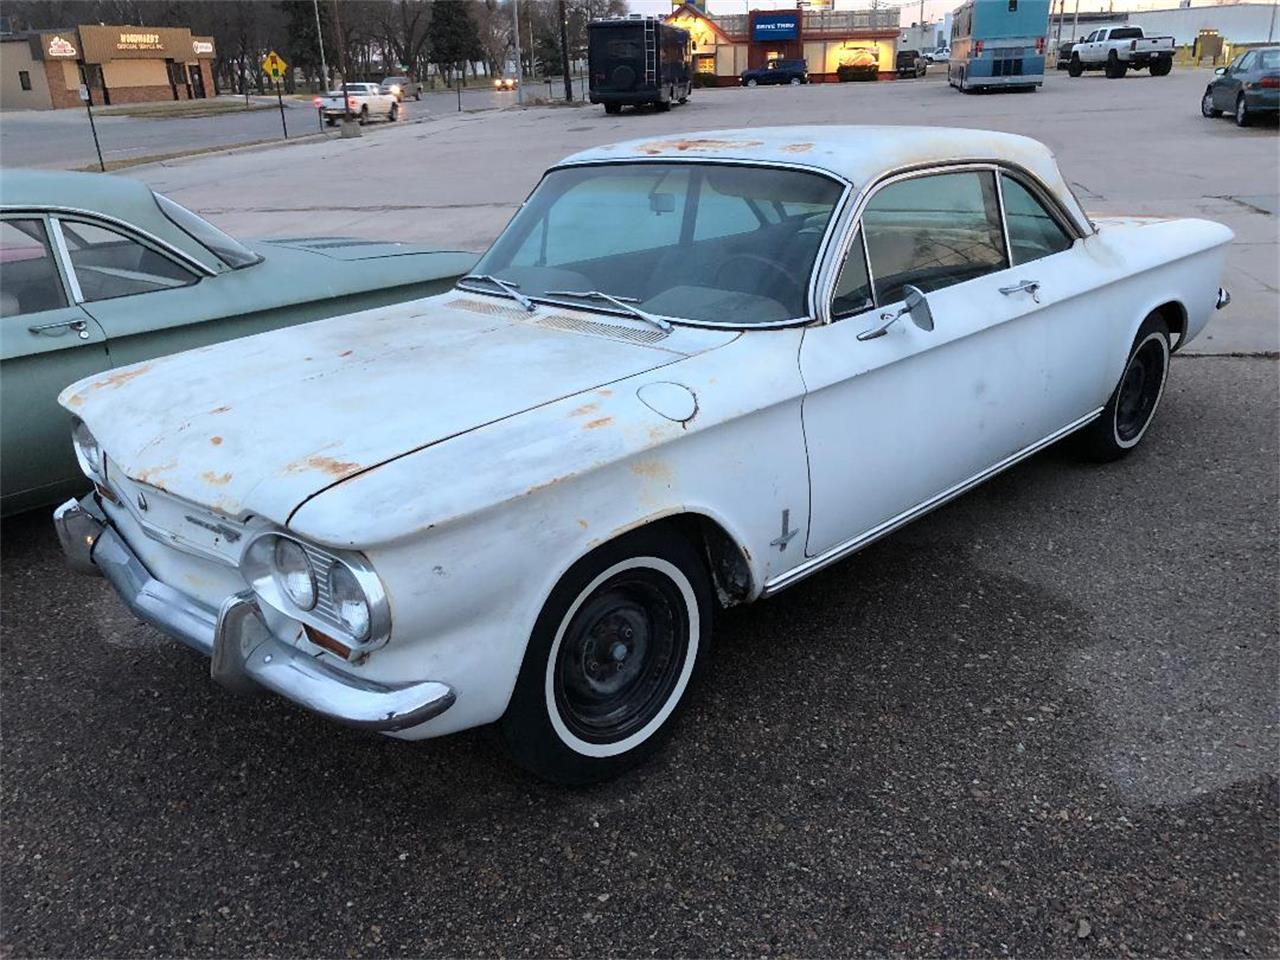 1963 Chevrolet Corvair Monza (CC-1057630) for sale in Hastings, Nebraska